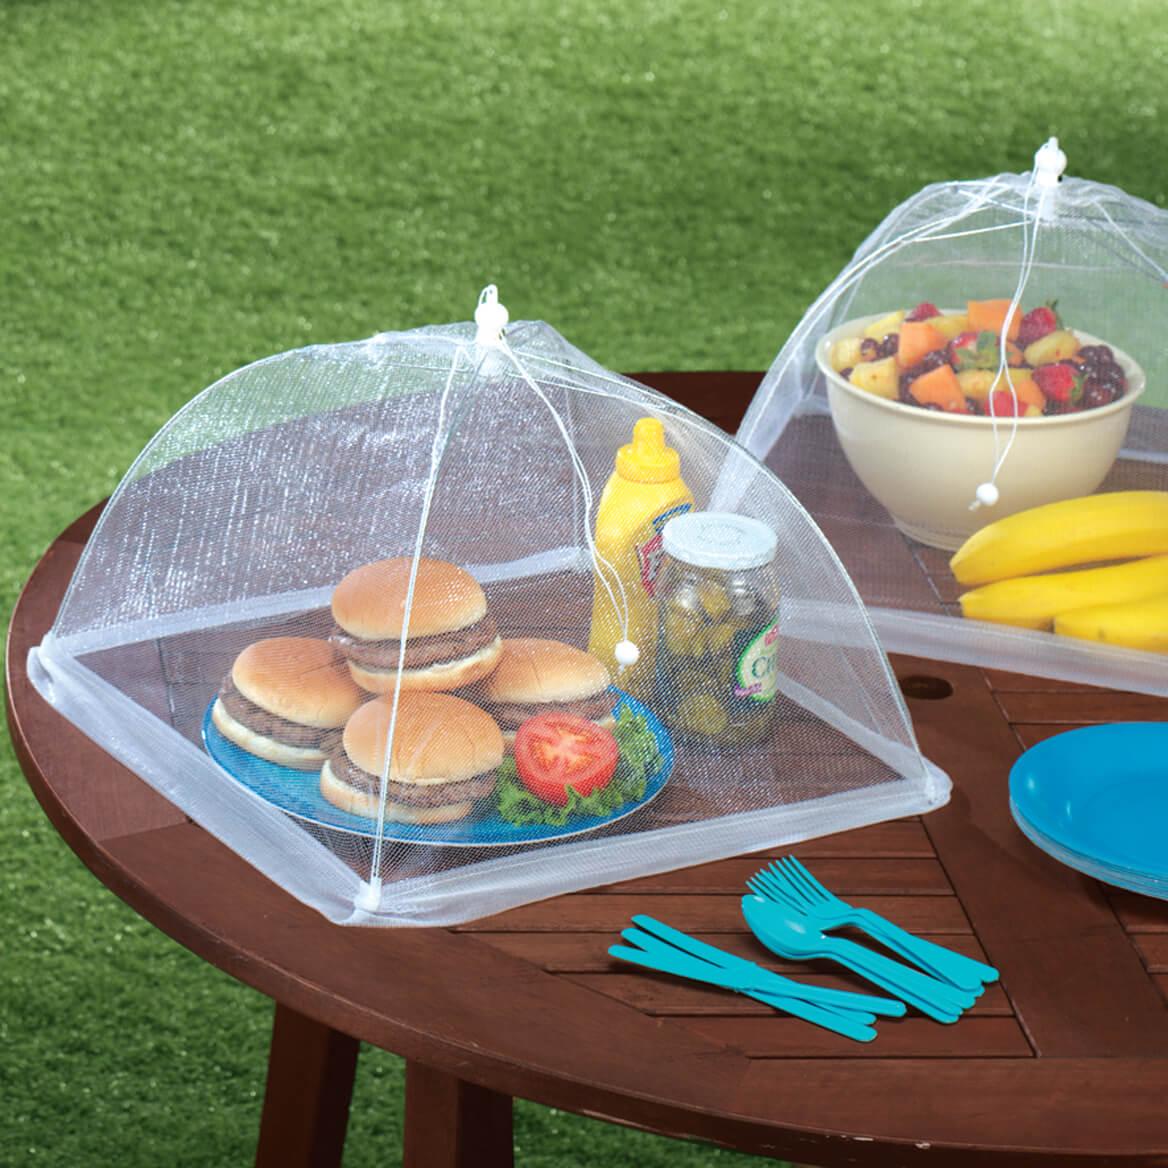 Food Tents, Set of 3-330123